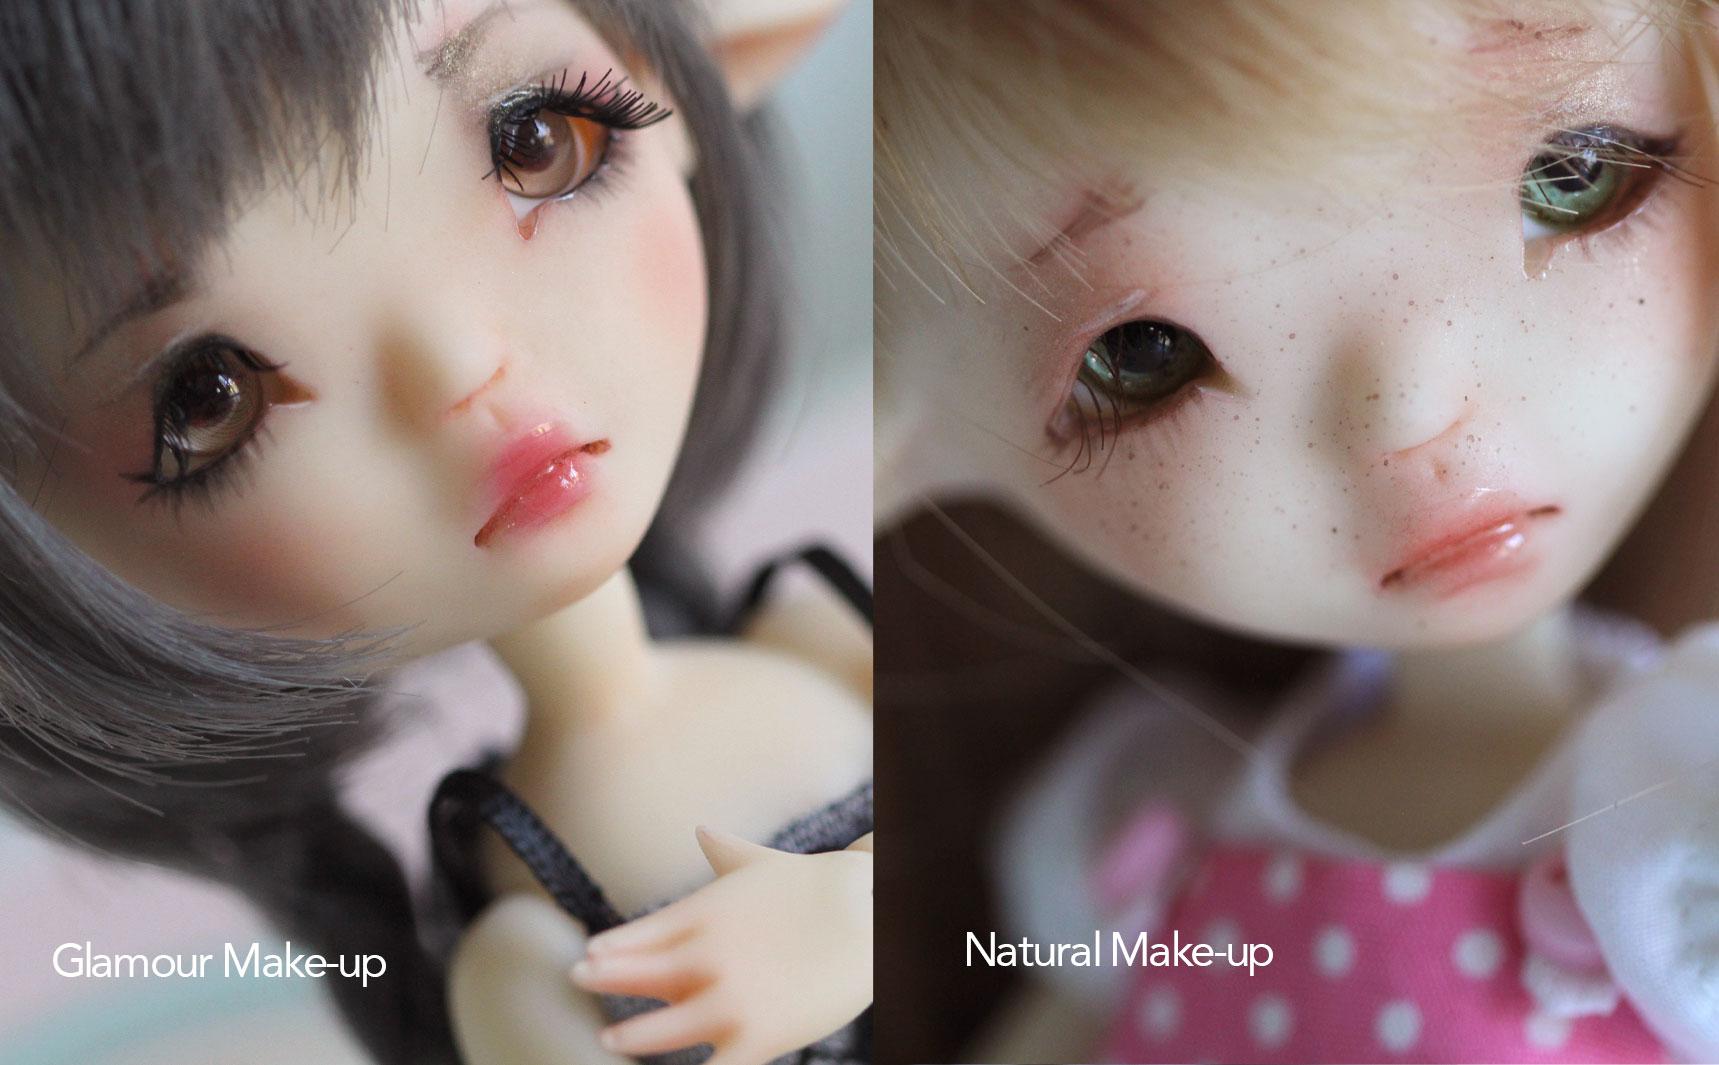 malicie-cream-nympheas-dolls-045